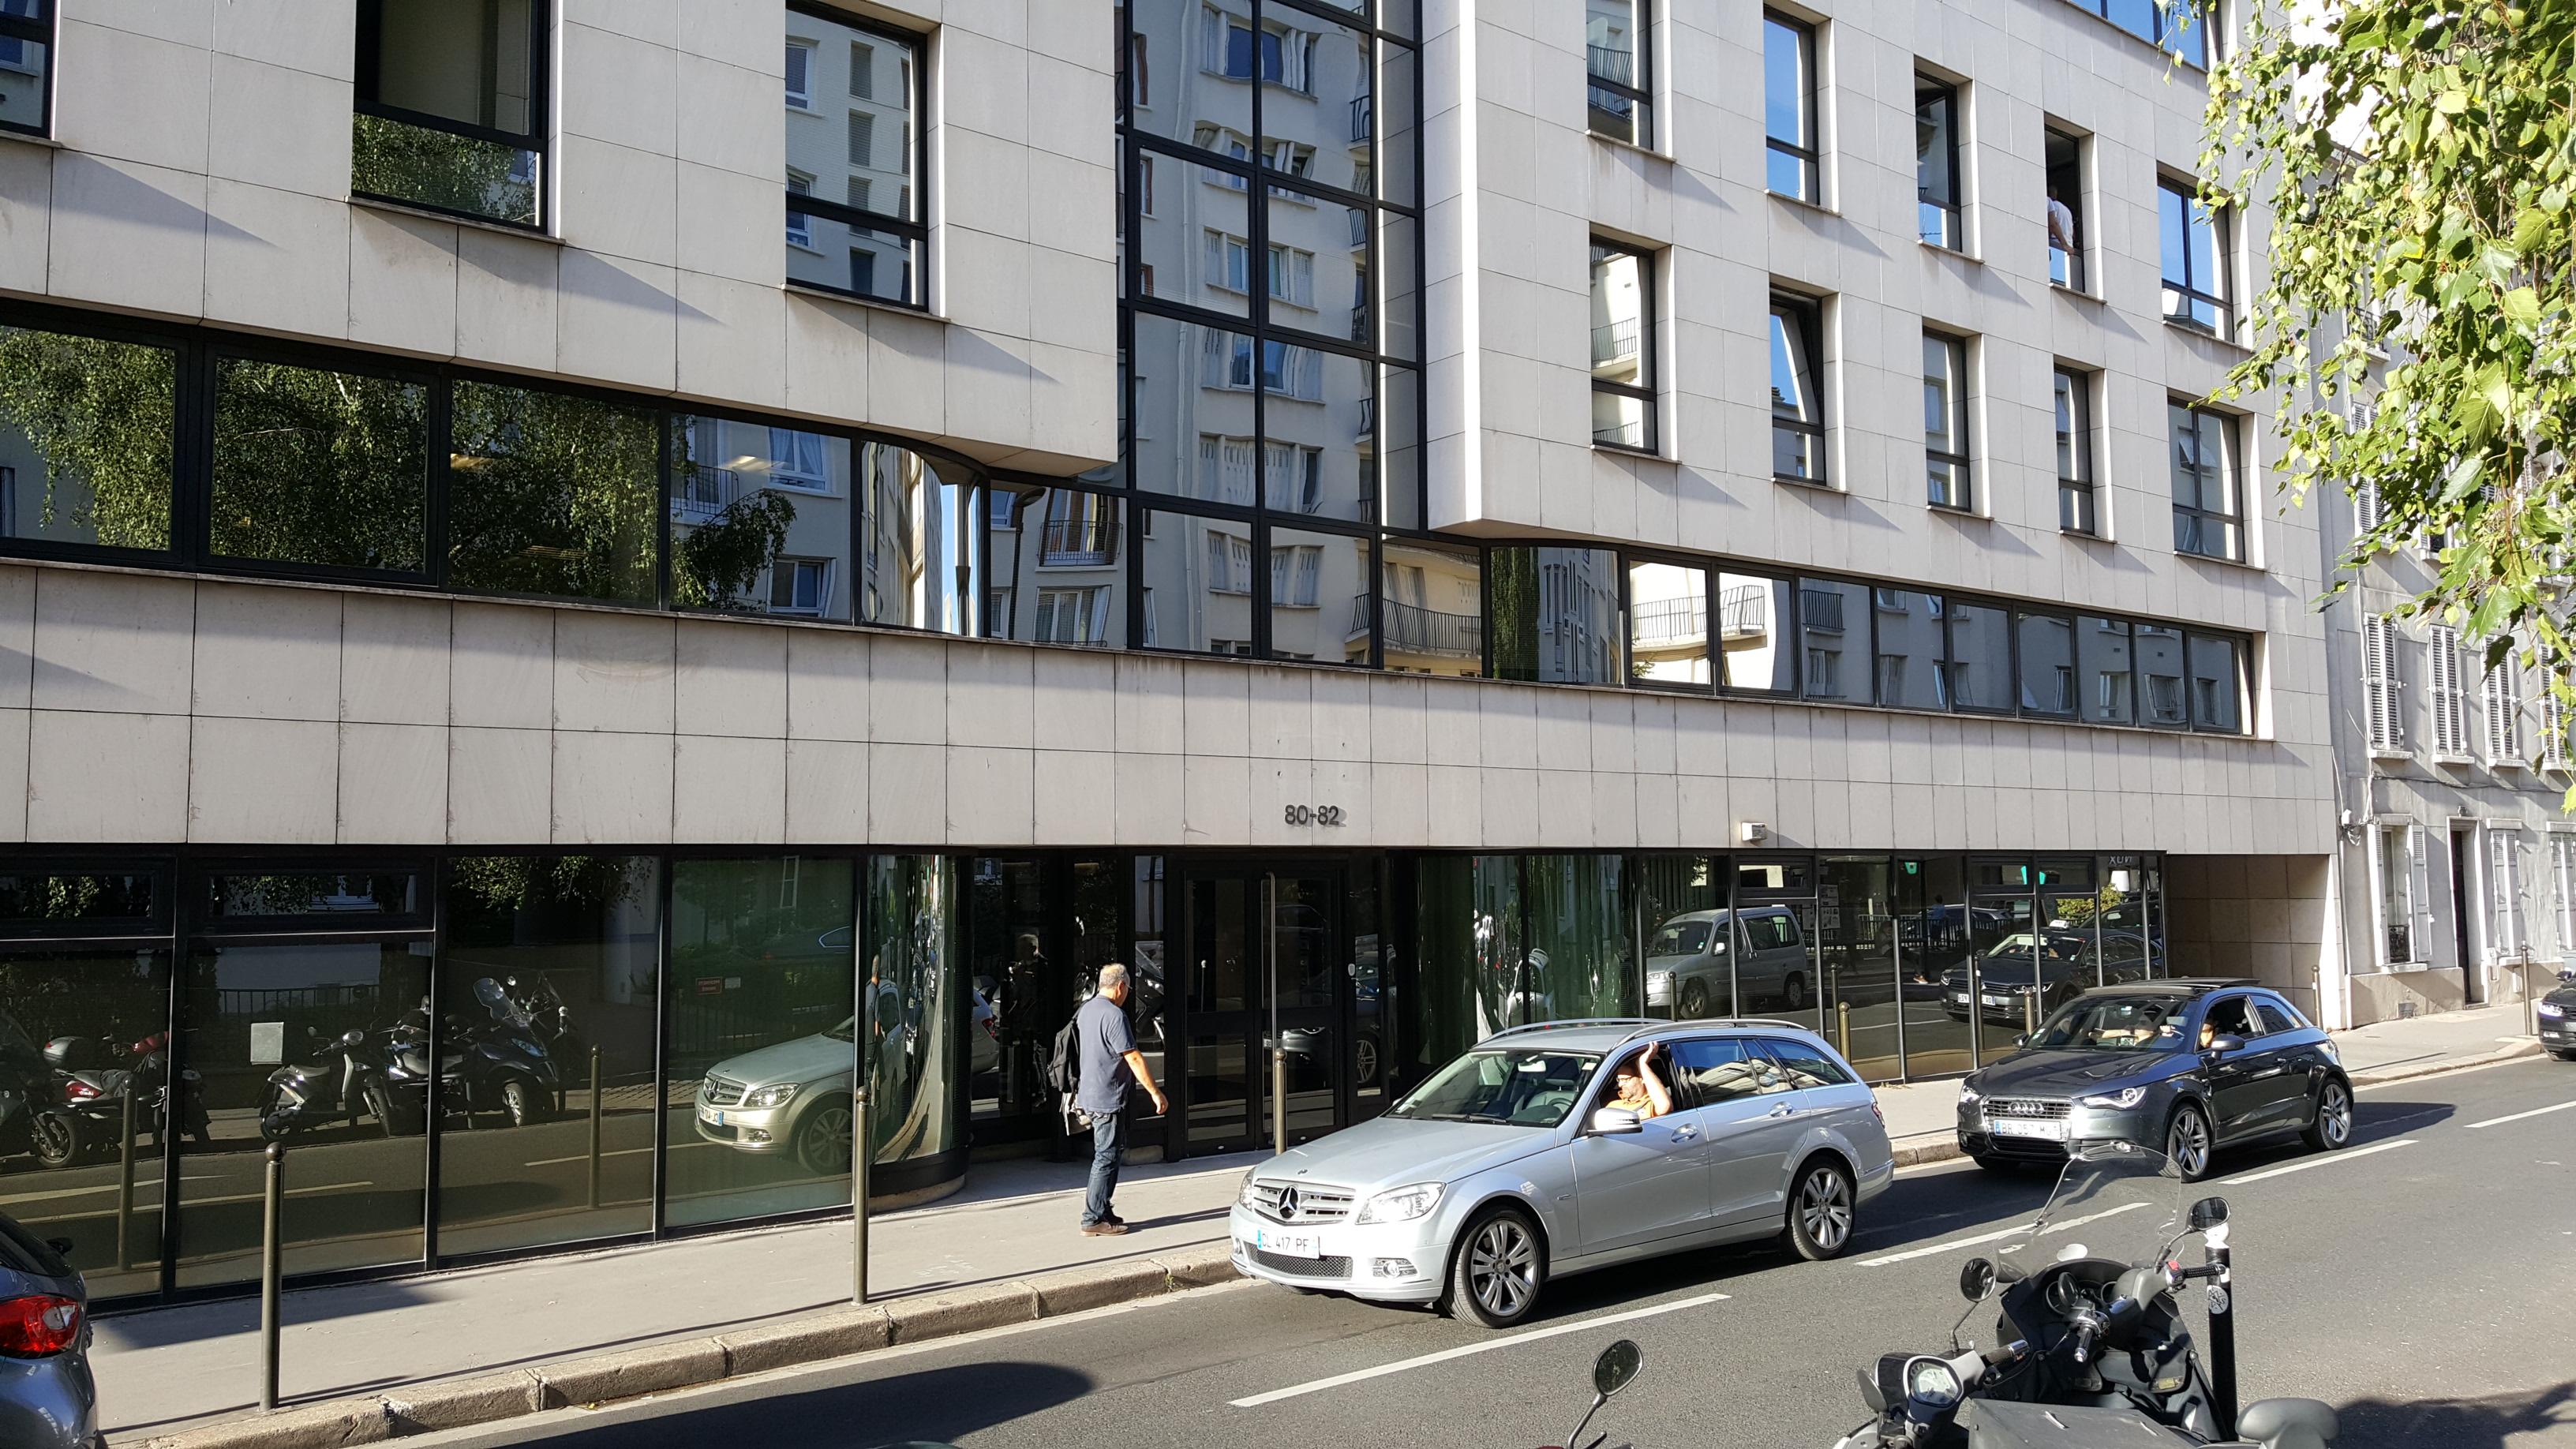 80-82 rue Gallieni à Boulogne-Billancourt